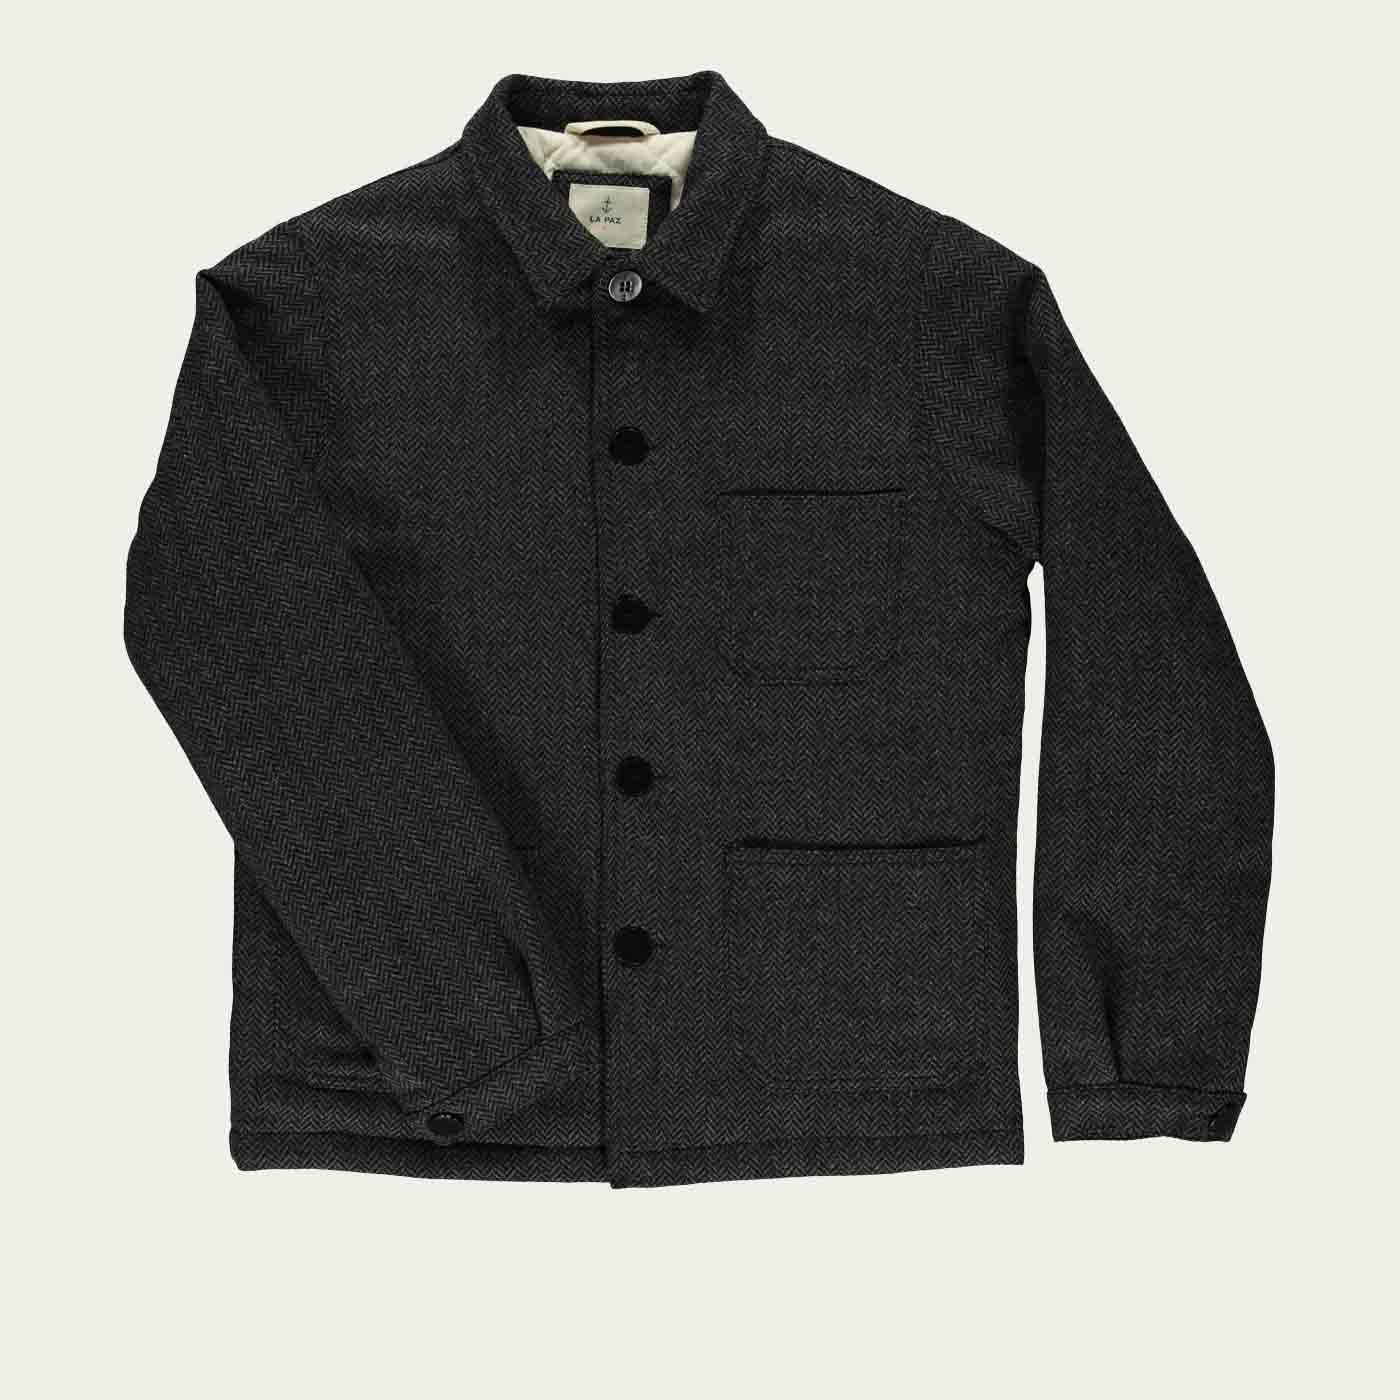 Green/Black Herringbone Baptista Worker Jacket | Bombinate